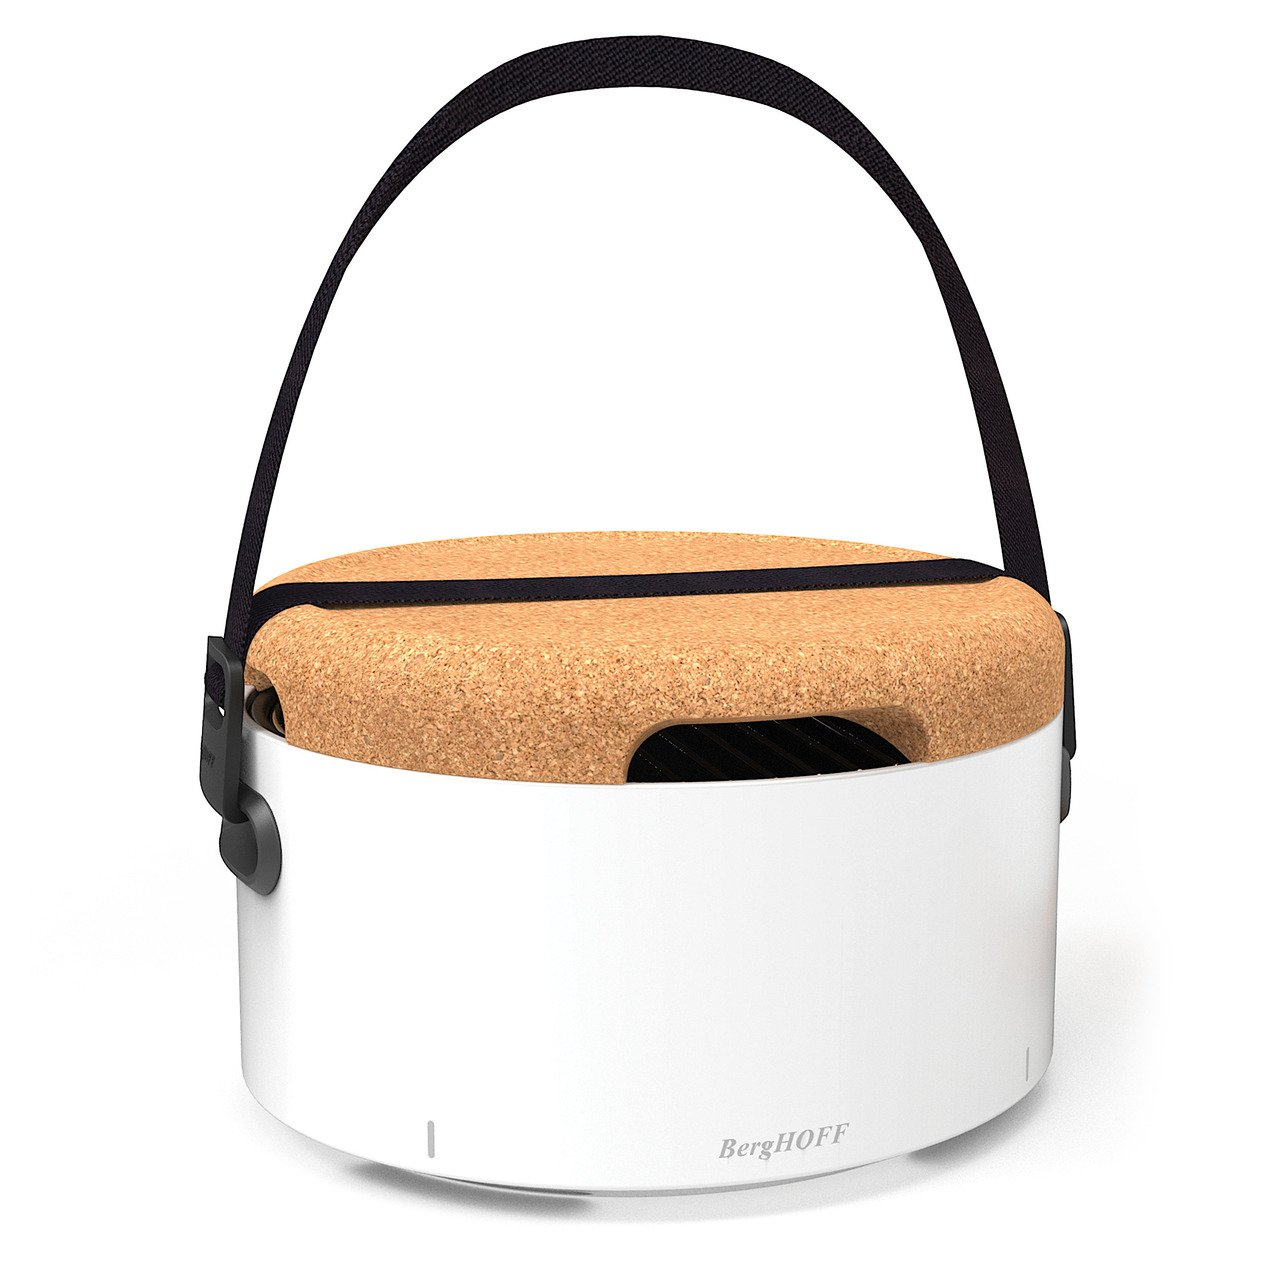 TABLE BBQ桌上型烤爐,Yahoo奇摩購物中心9月20日前49折特價5,0...